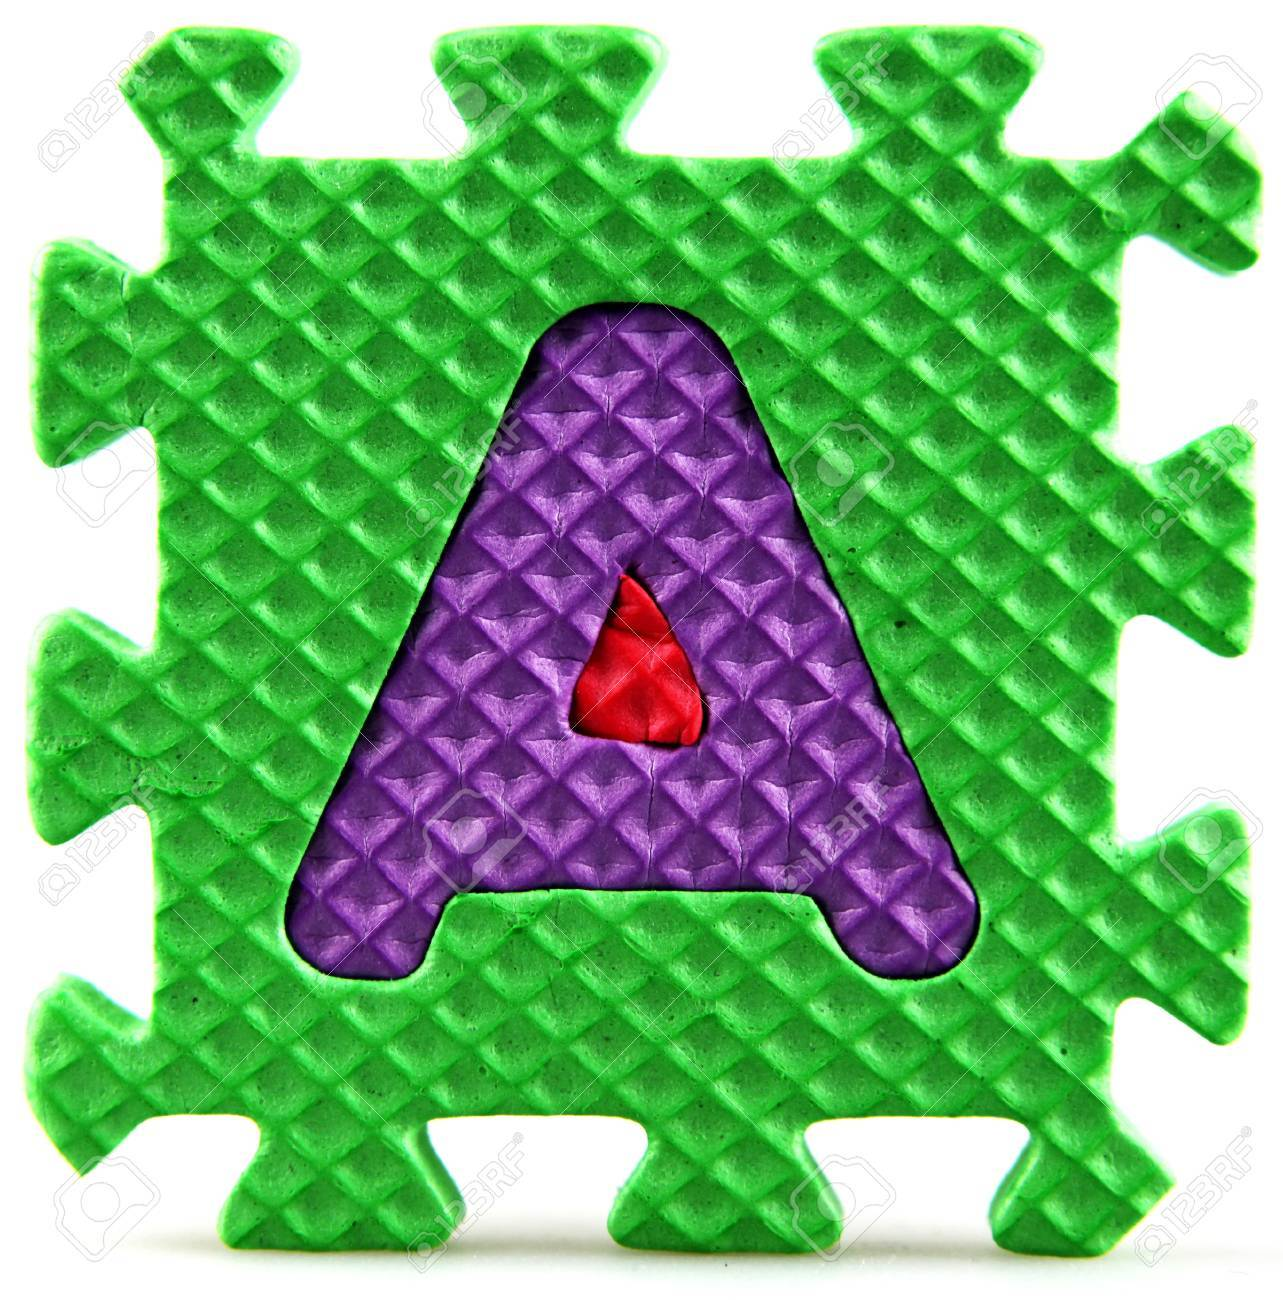 Alphabet puzzle pieces on white background Stock Photo - 9758952